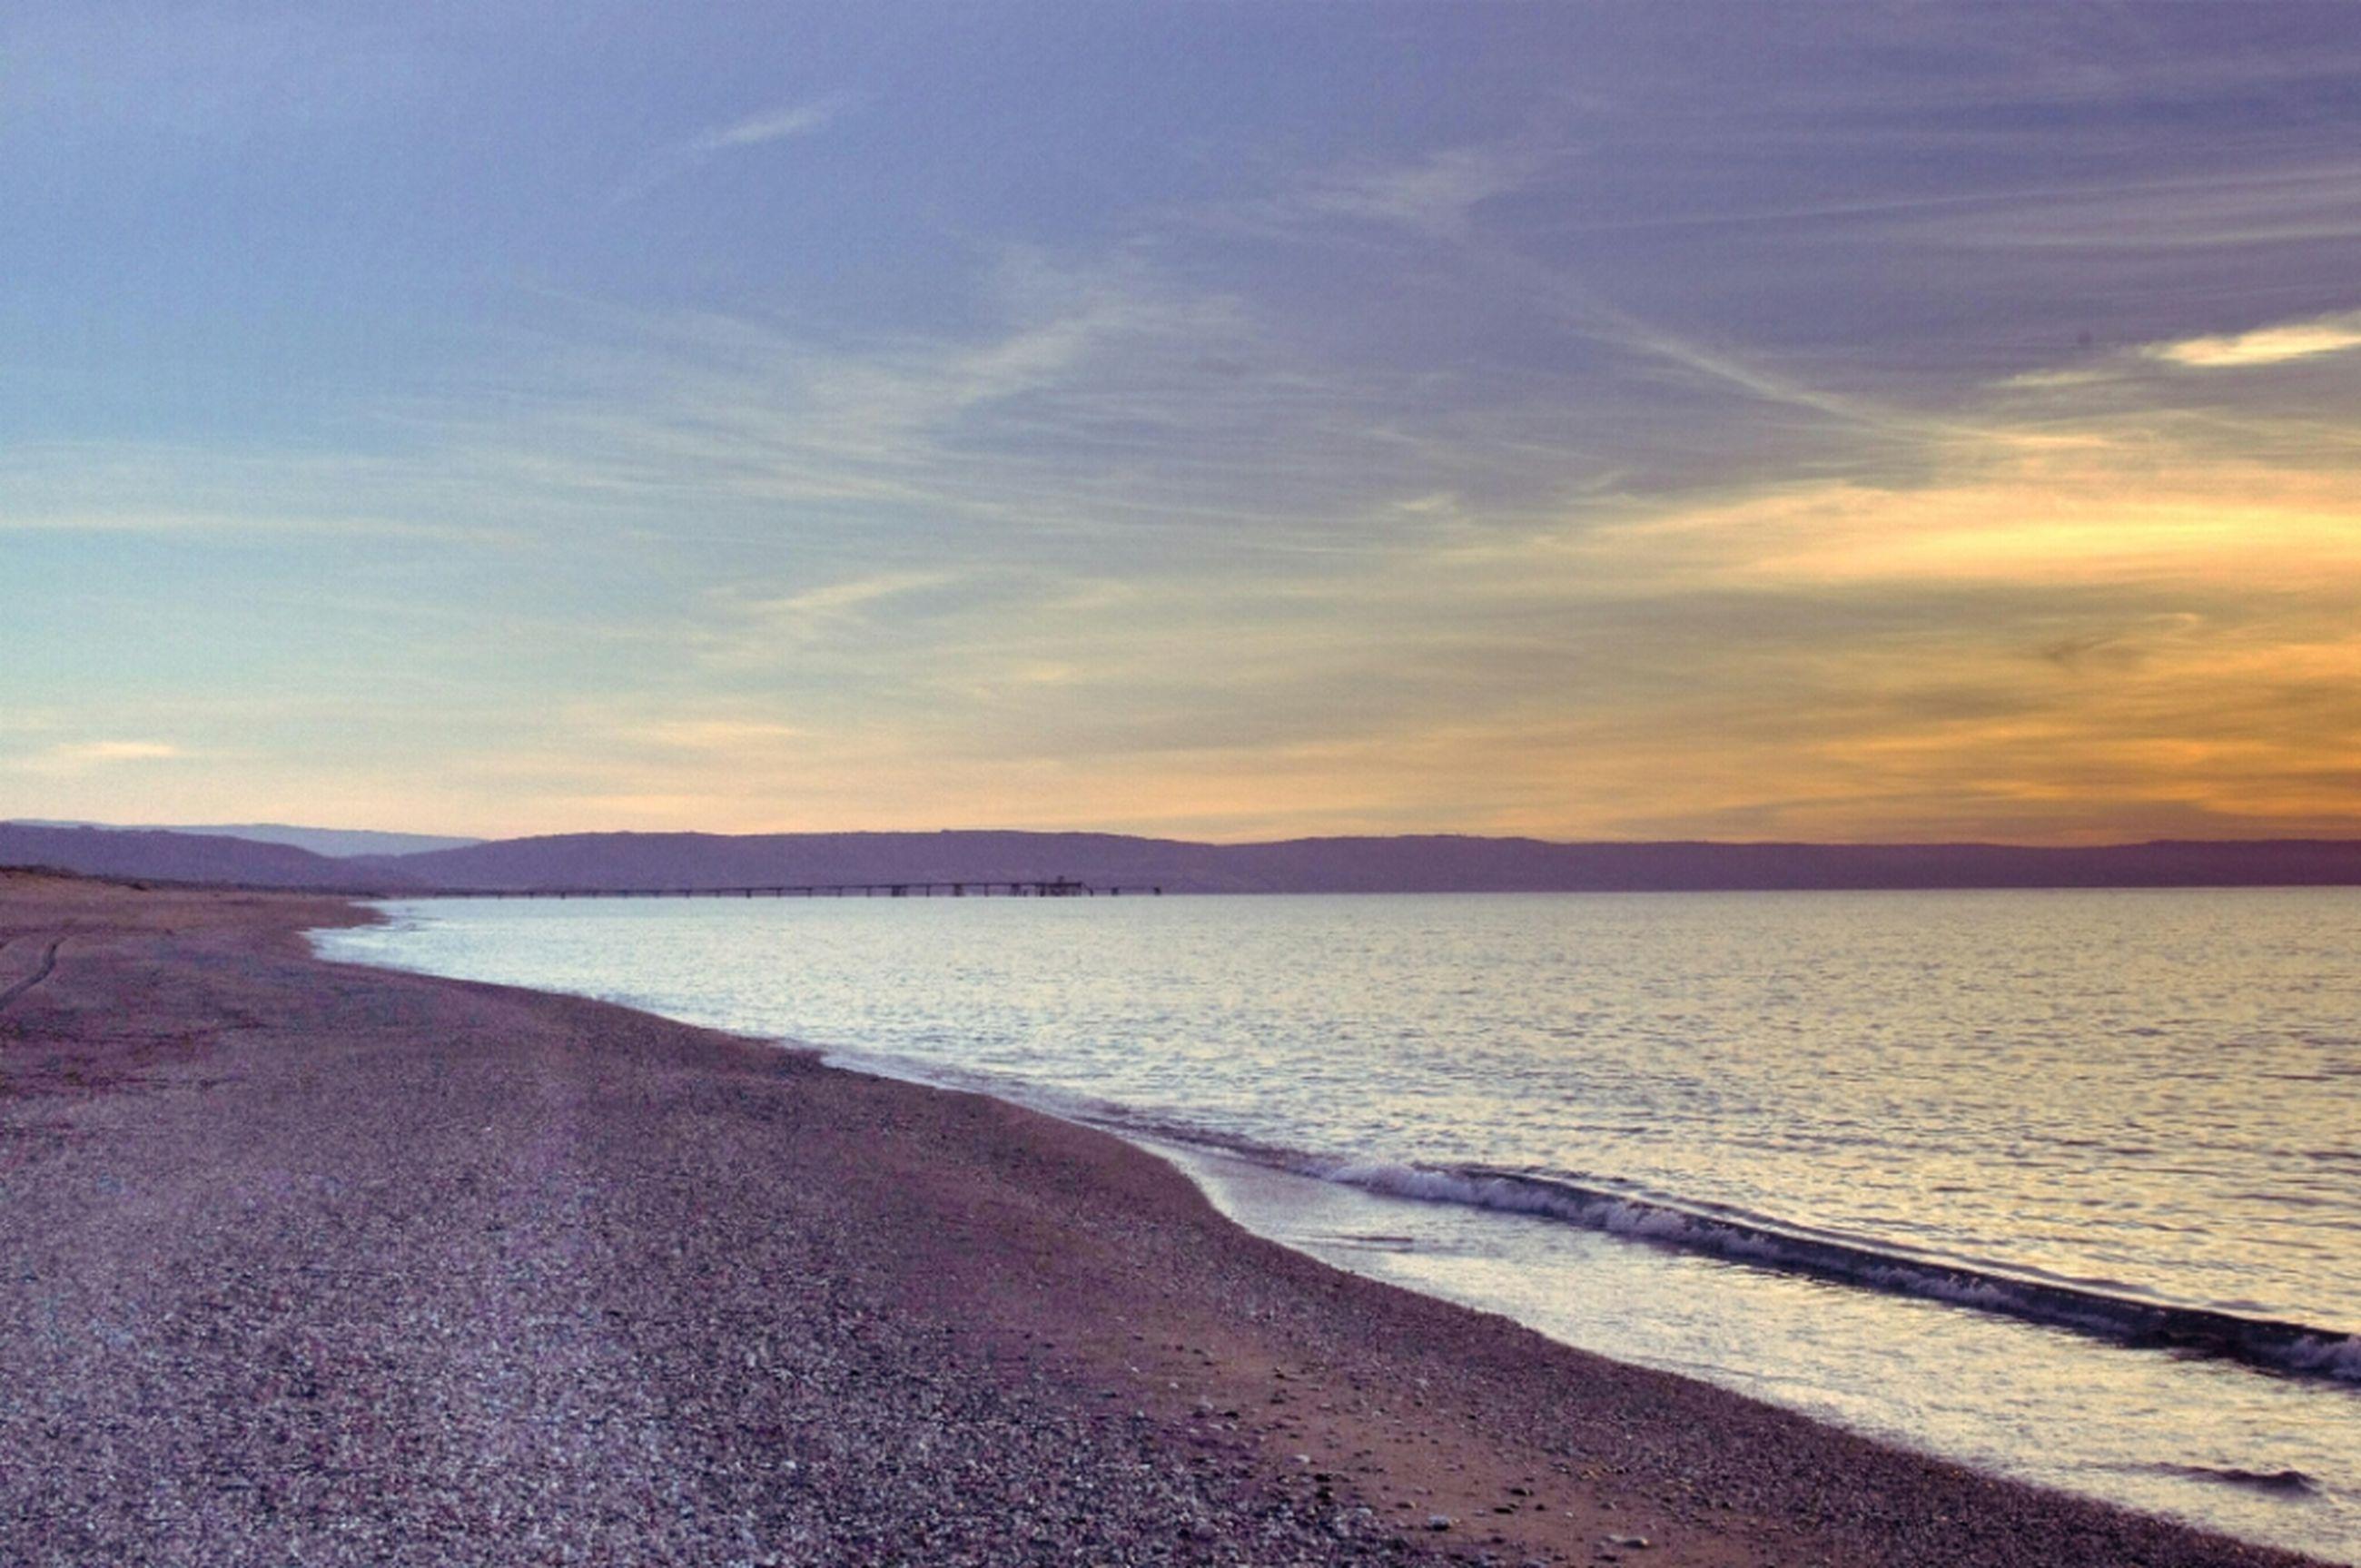 sea, beach, water, tranquil scene, scenics, tranquility, beauty in nature, sunset, sky, shore, sand, horizon over water, nature, idyllic, cloud - sky, coastline, cloud, non-urban scene, remote, outdoors